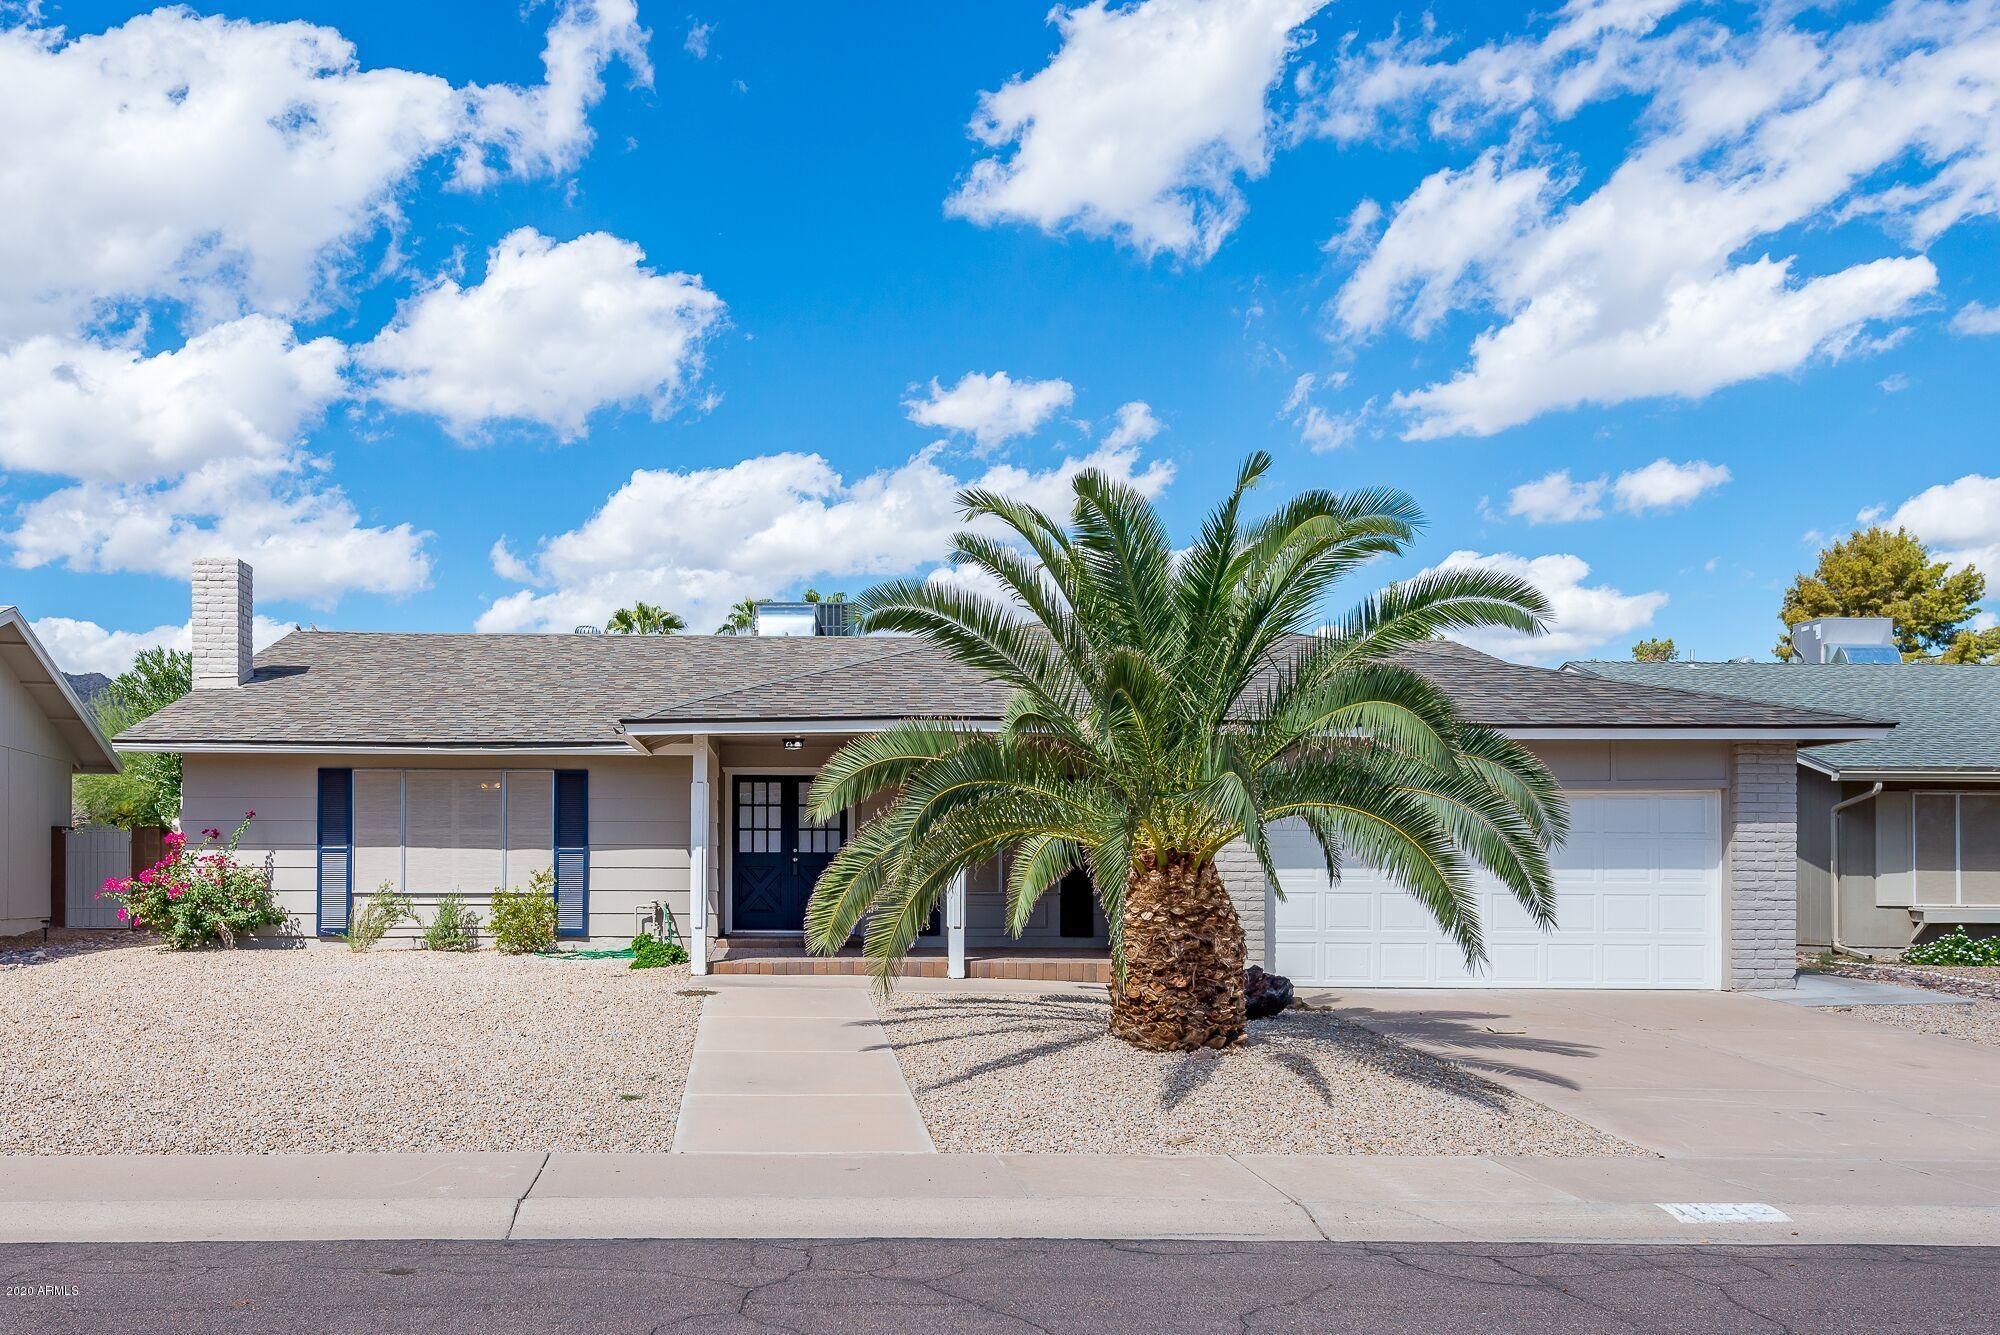 MLS 6078811 Phoenix Metro Area, Phoenix, AZ 85044 Adult Community in Phoenix